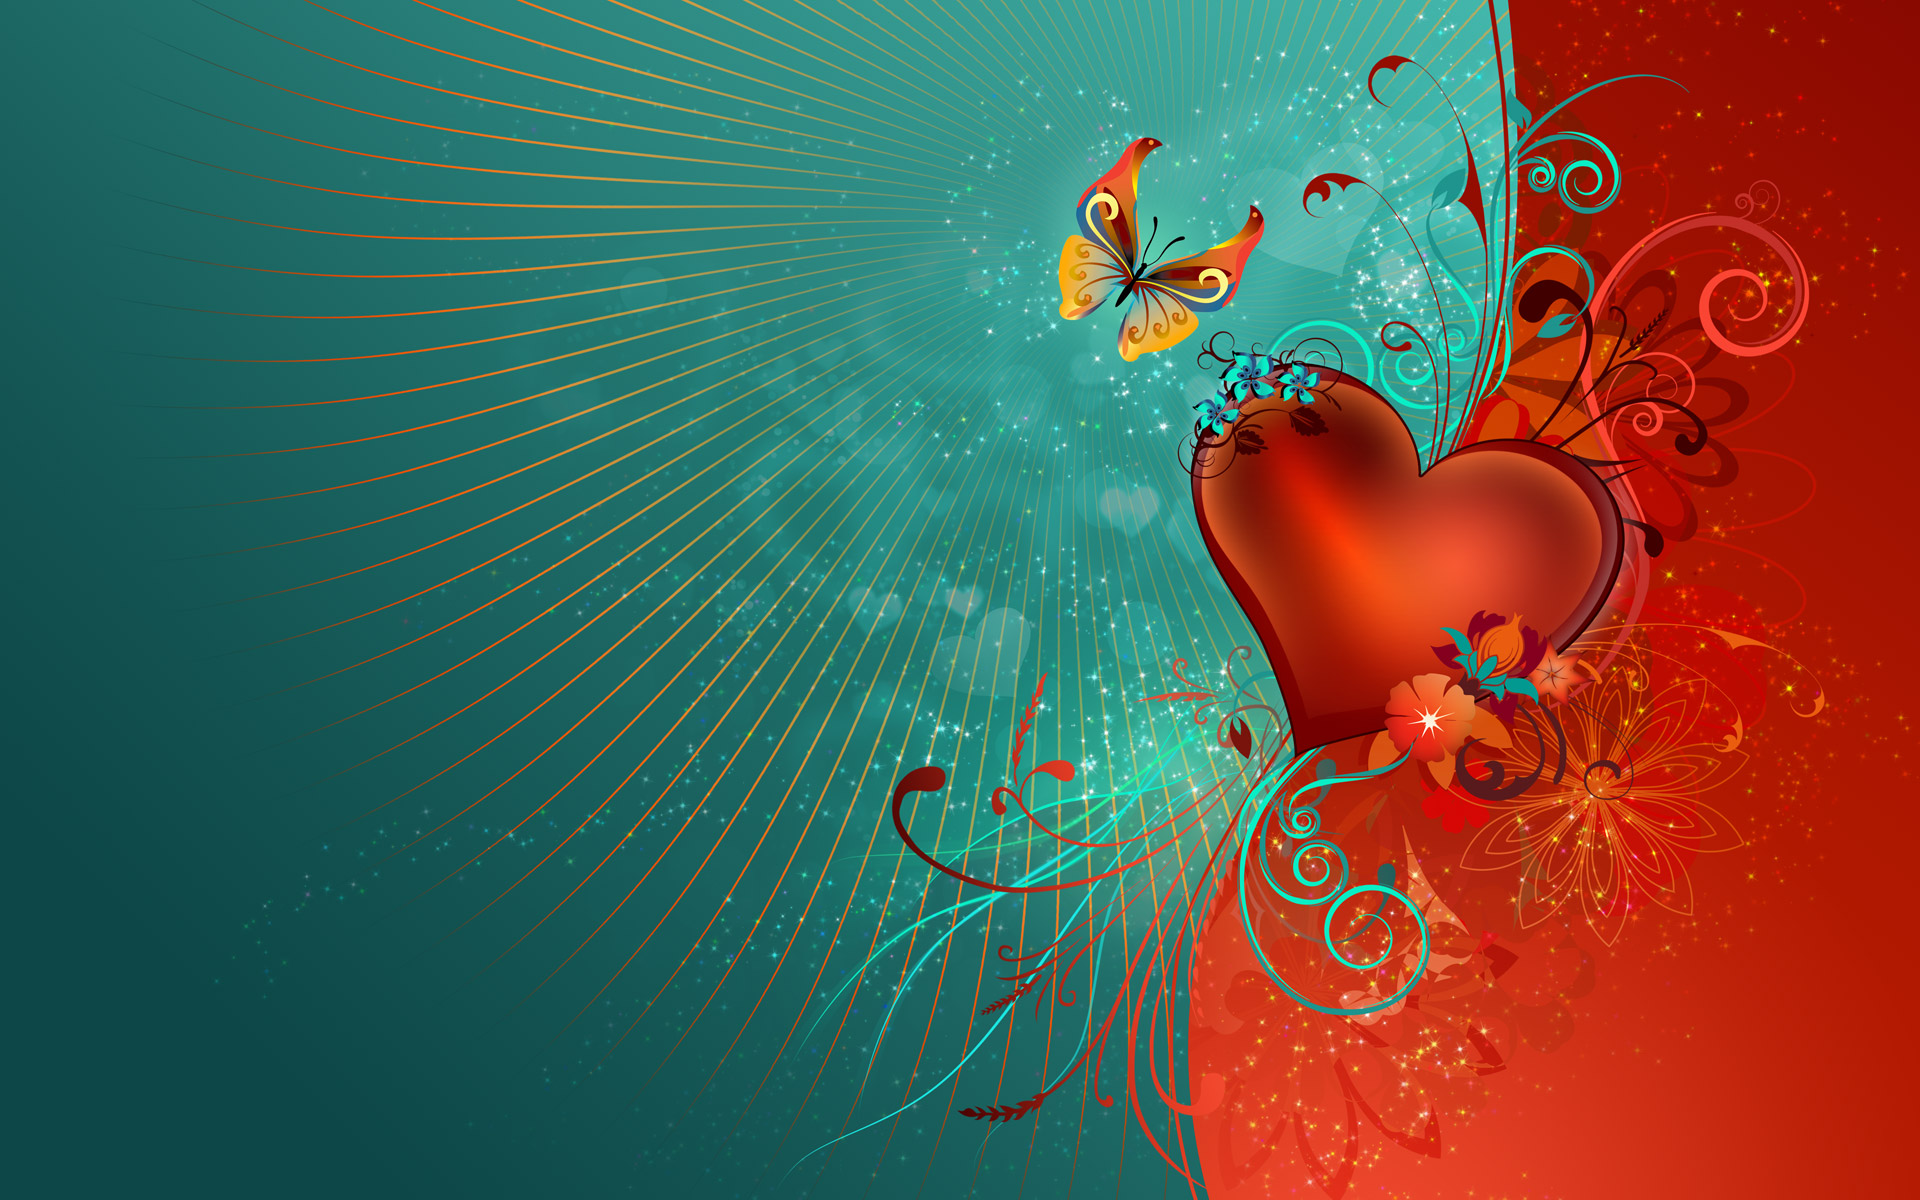 valentines wallpapers free | pixelstalk